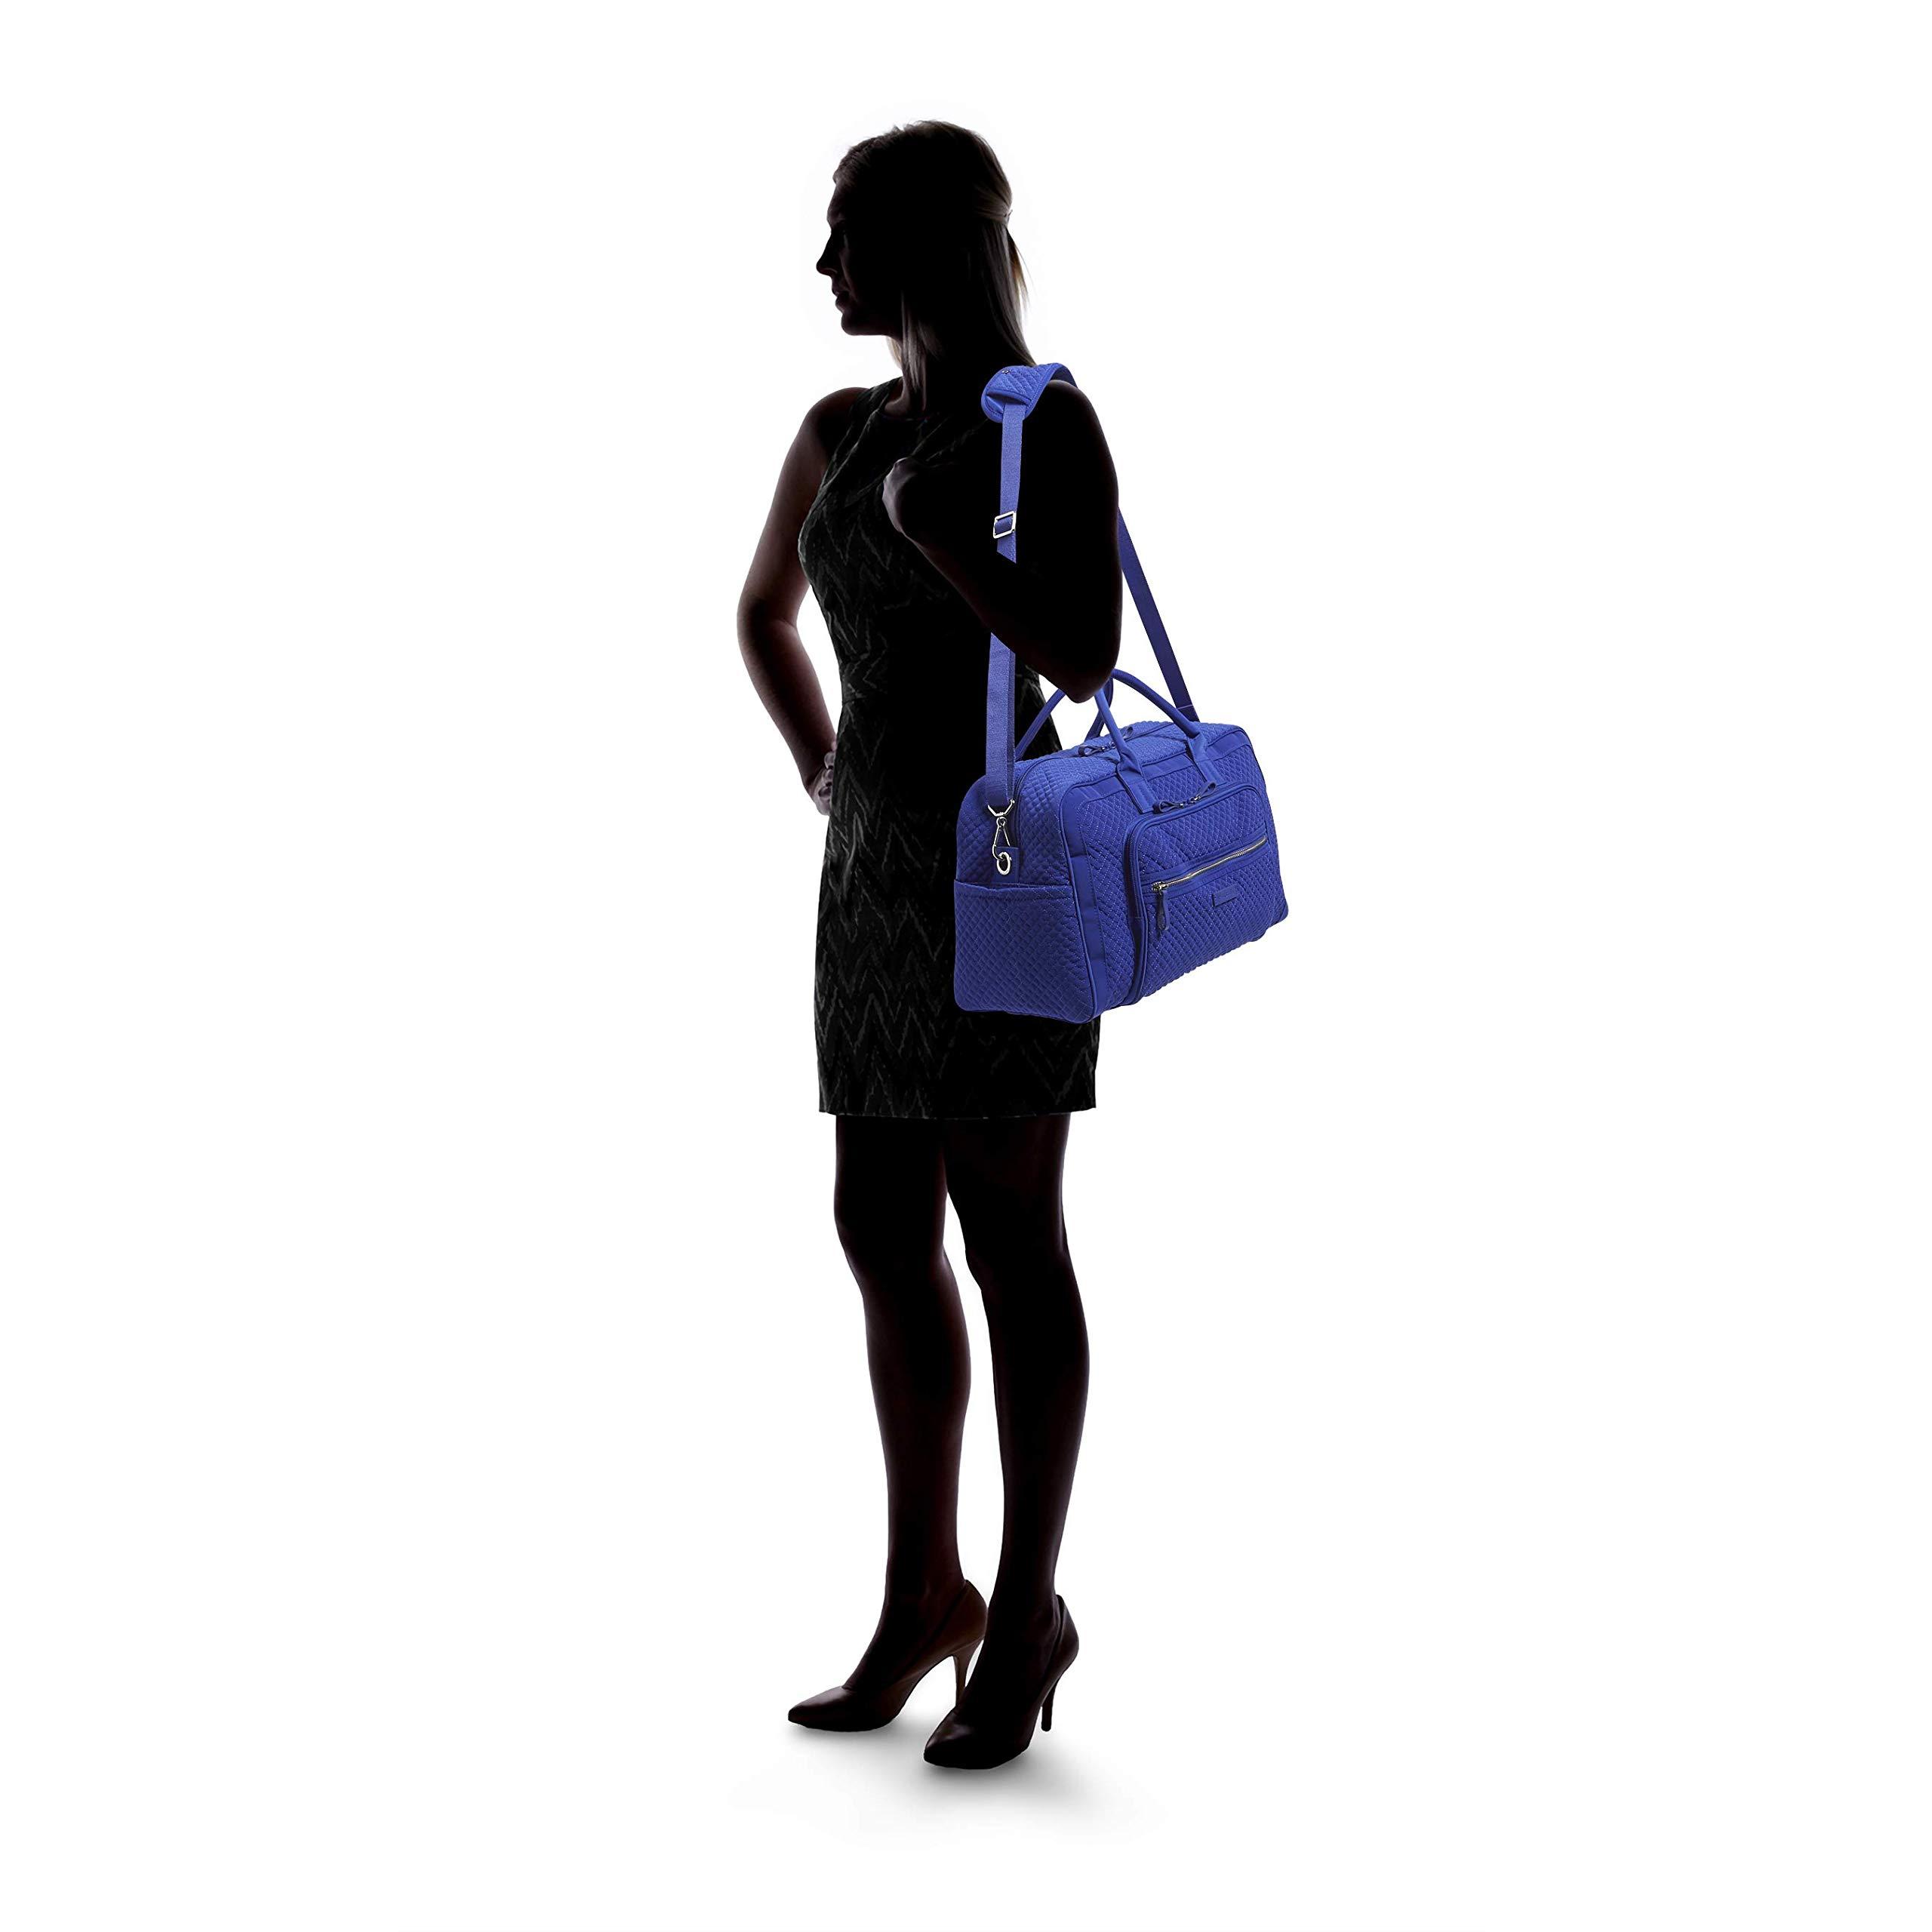 Vera Bradley Iconic Compact Weekender Travel Bag Vera,  gage Blue, One Size by Vera Bradley (Image #5)